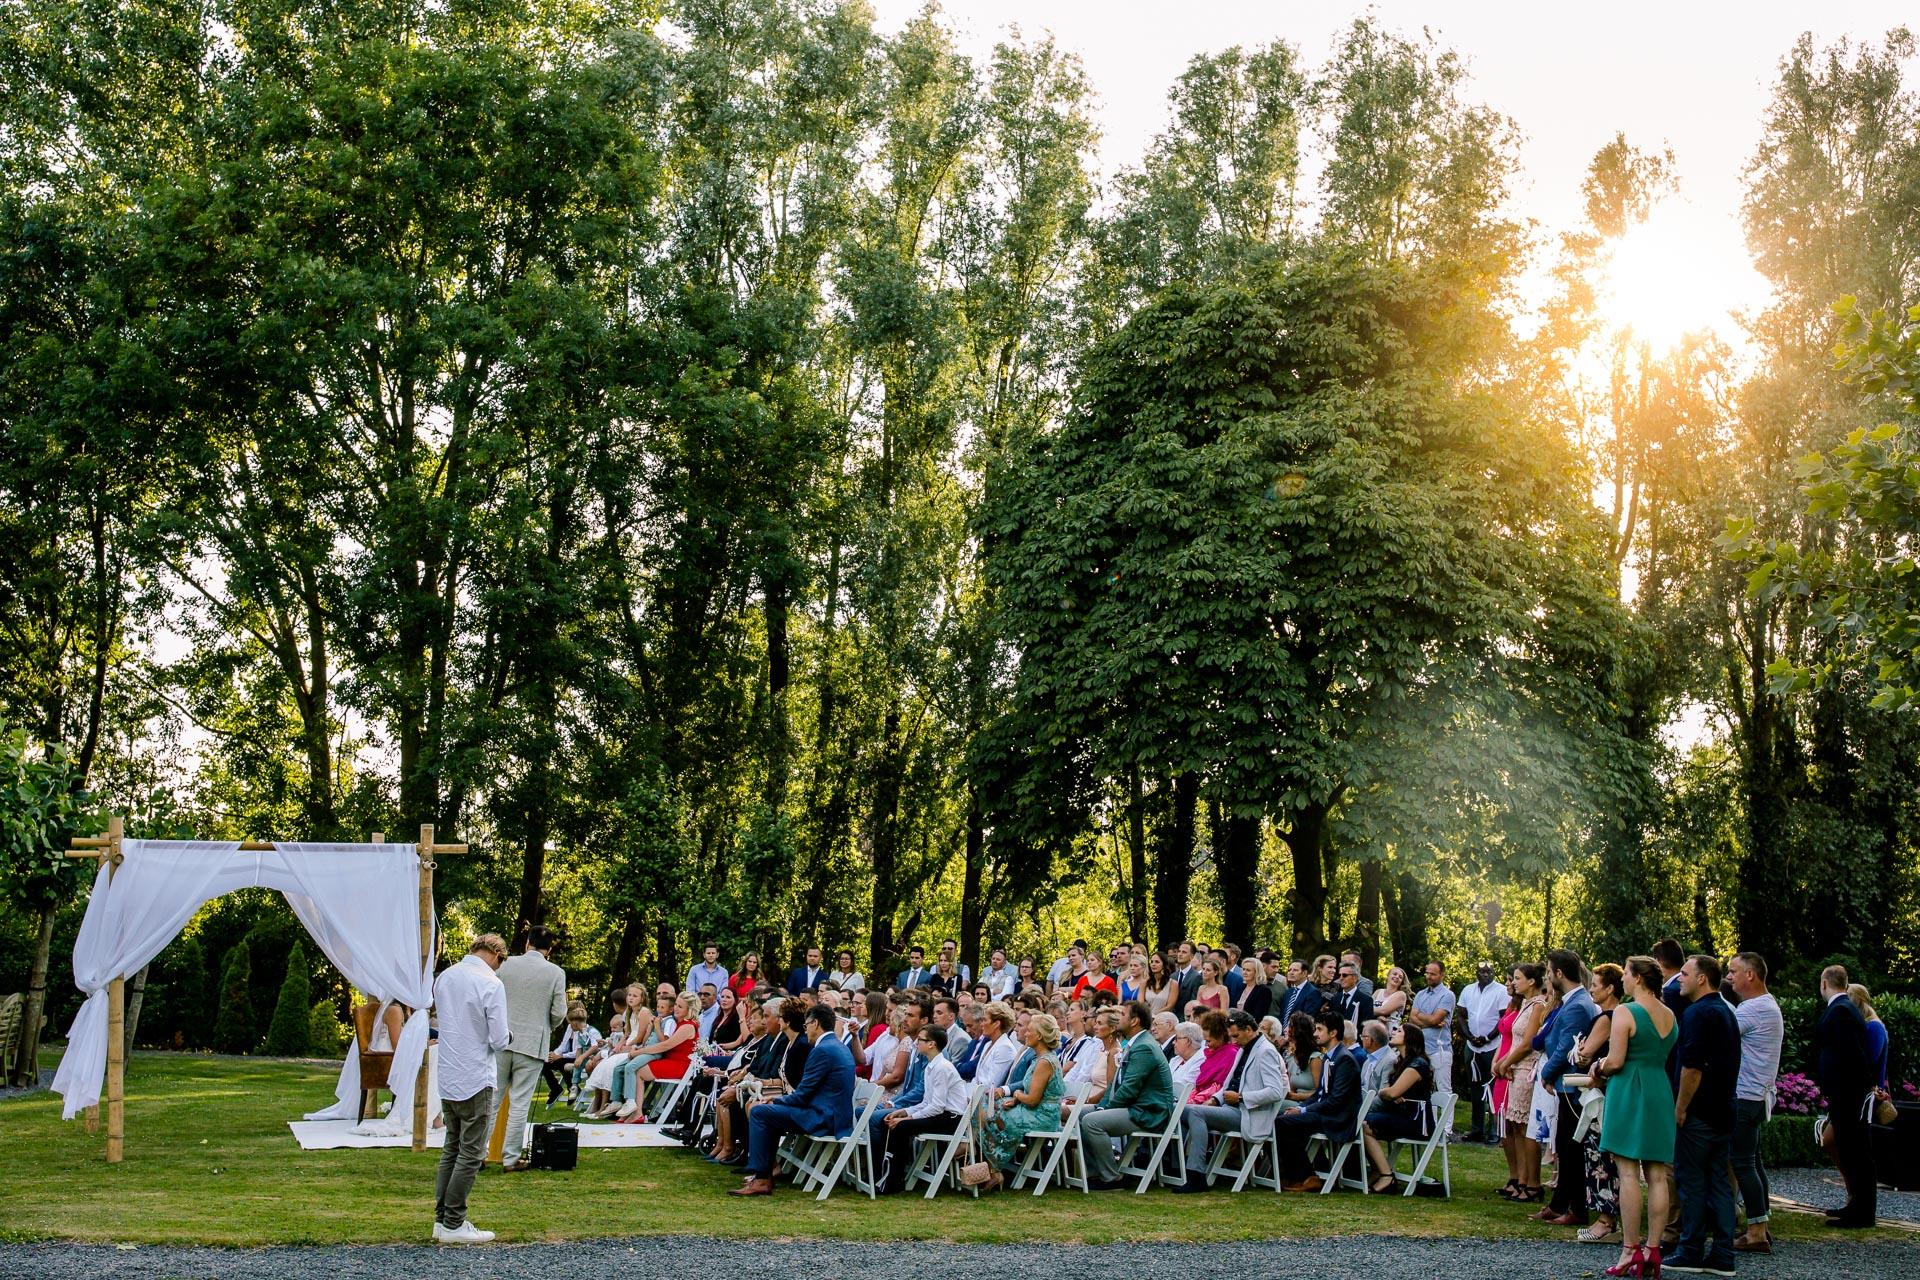 Buiten trouwen in de zomer